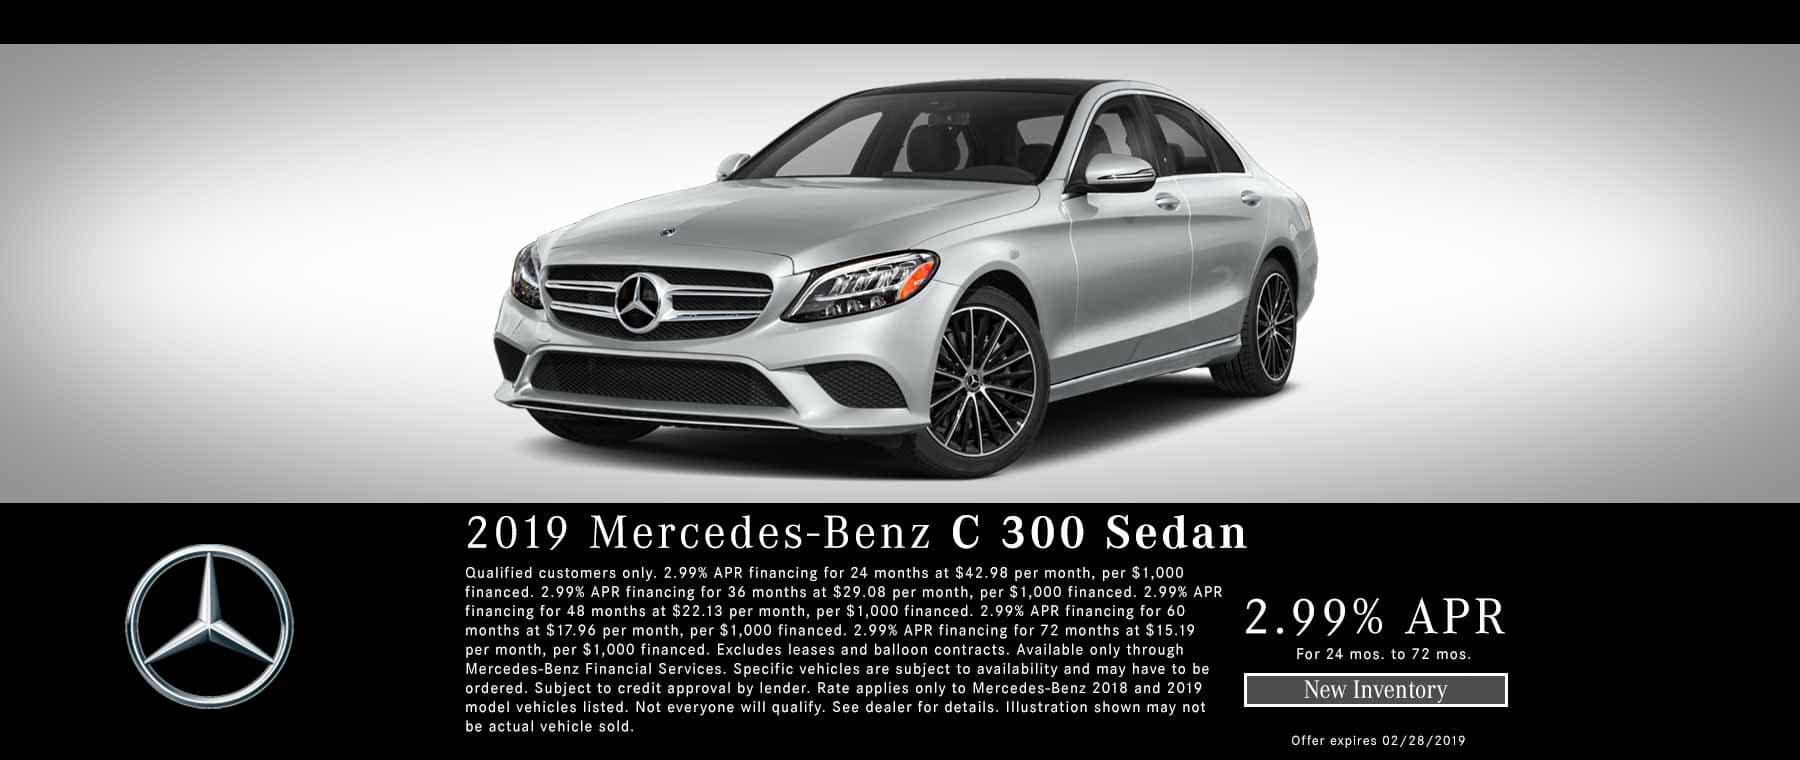 2019 Mercedes C300 FInance Special Bakersfield